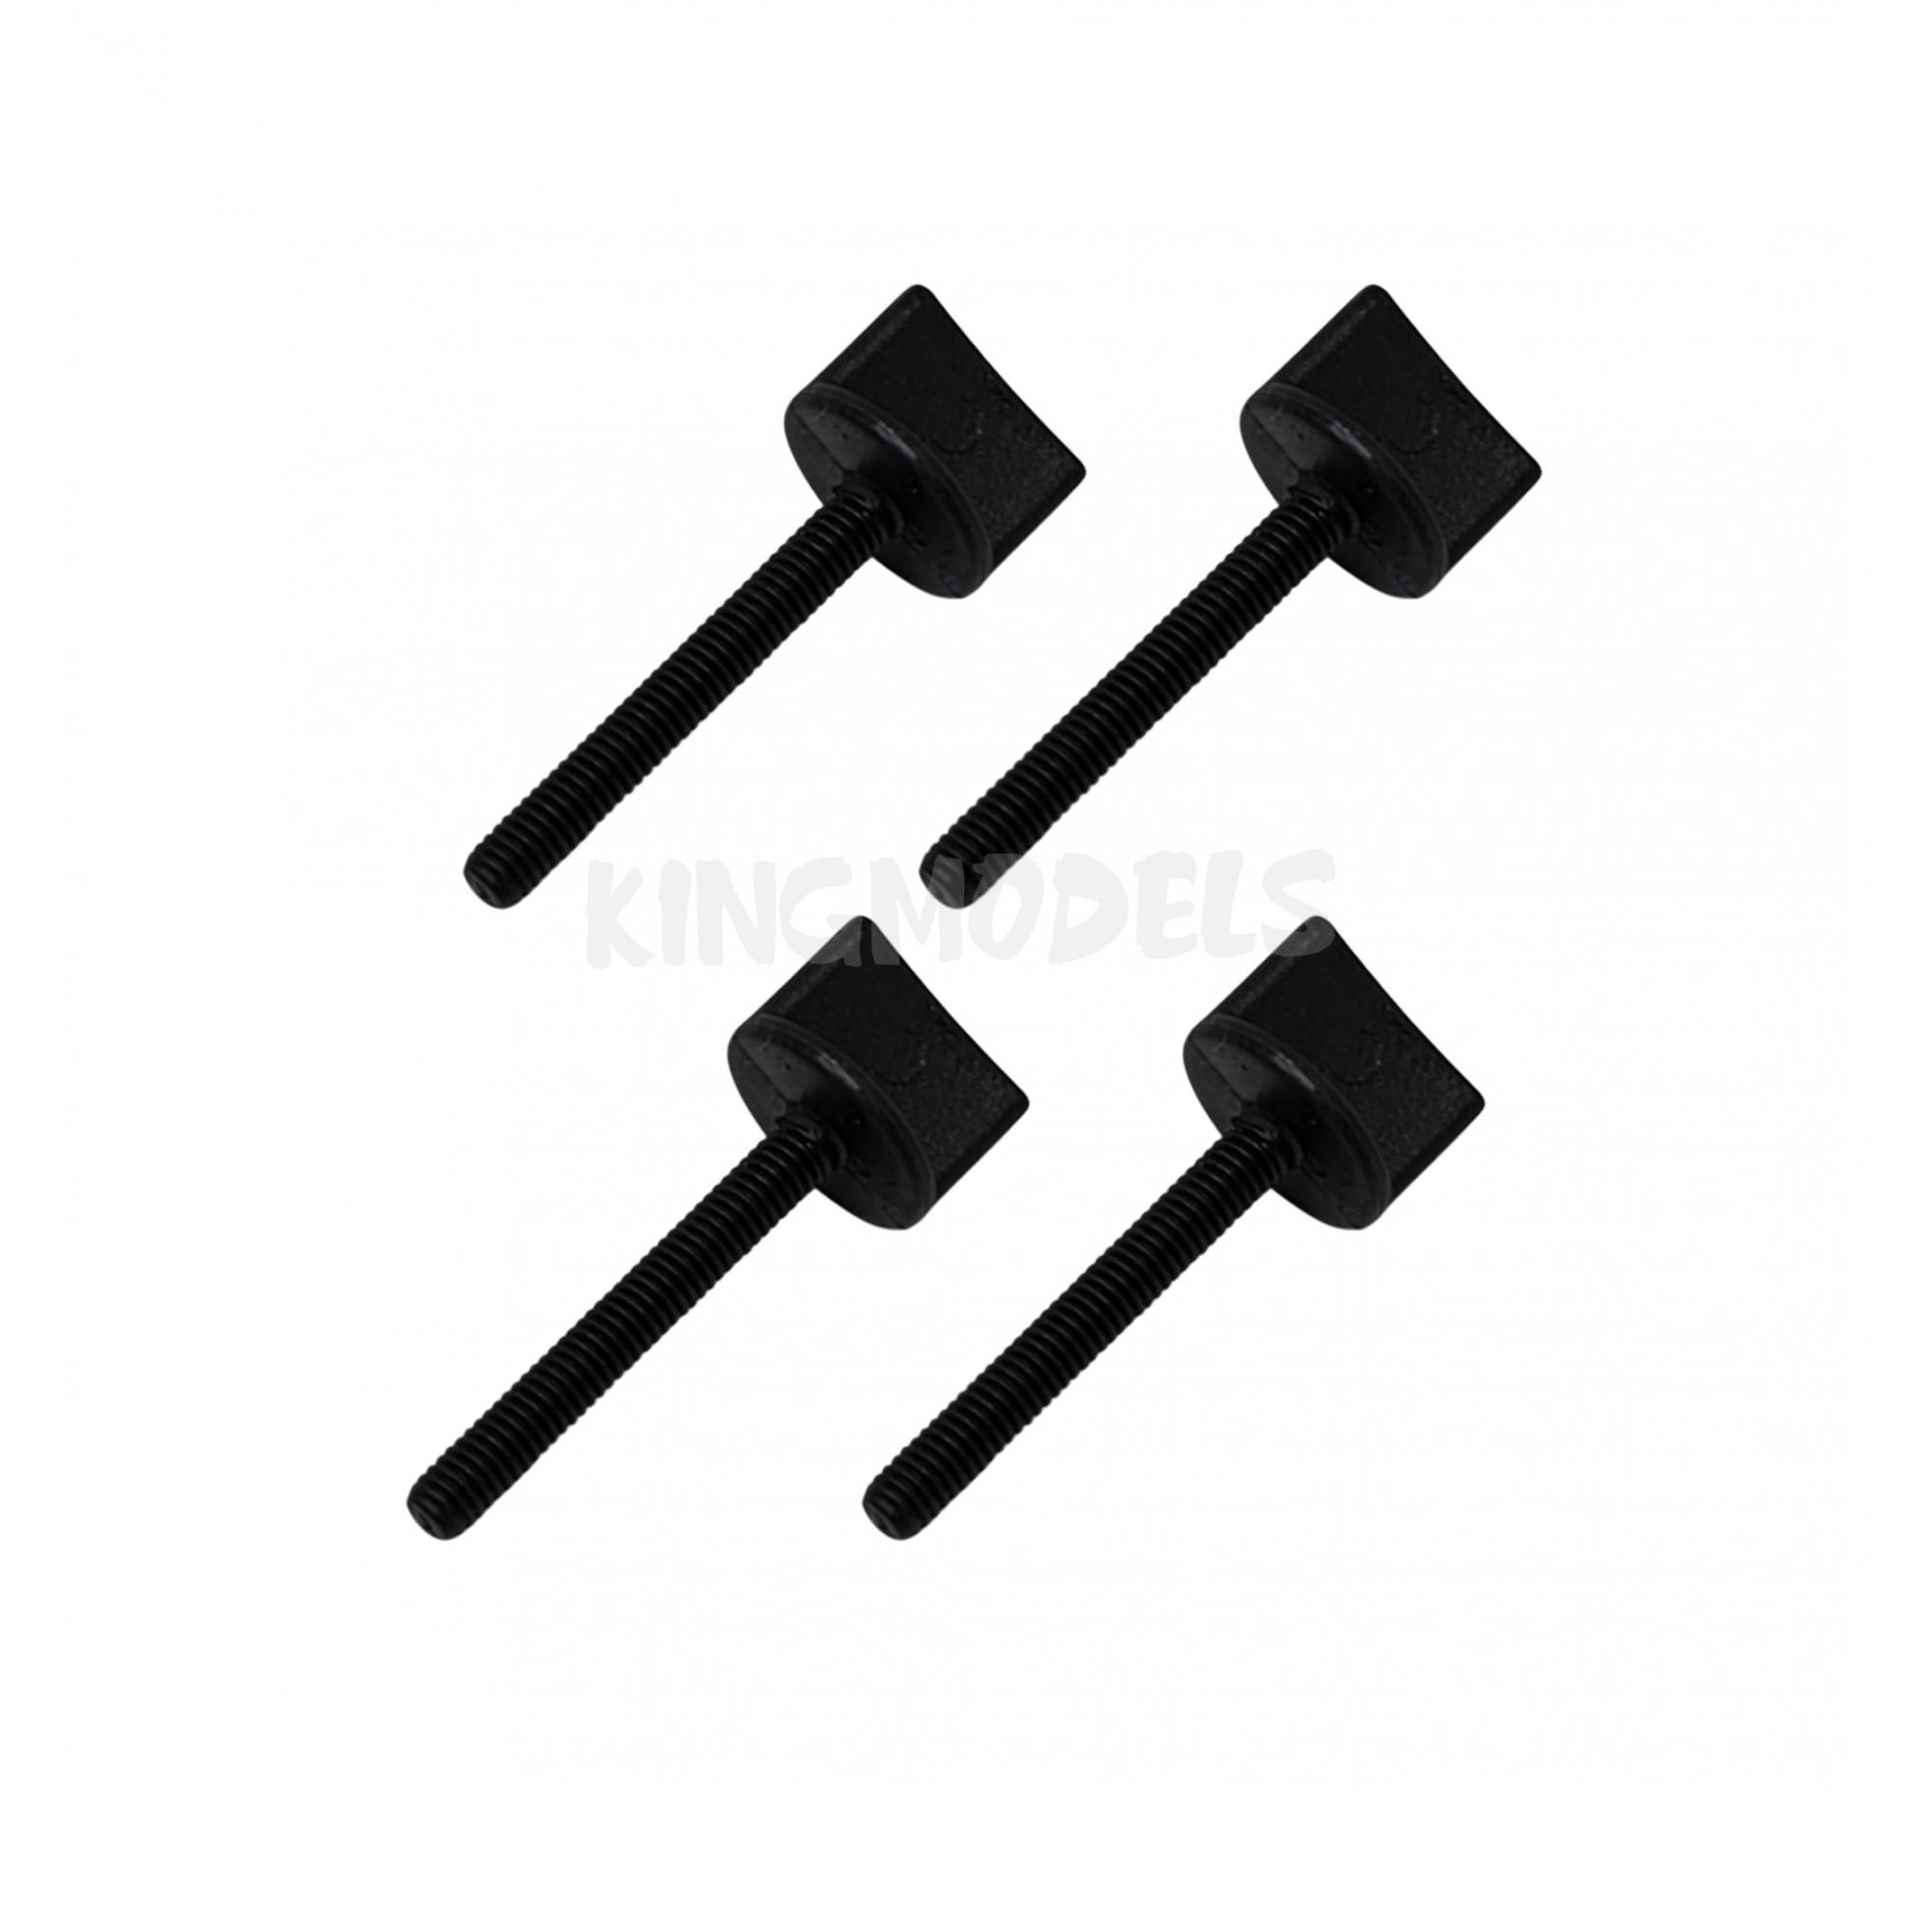 Parafuso Nylon Preto M4 x 45mm - Fixação Asa Aeros - 4pçs  - King Models